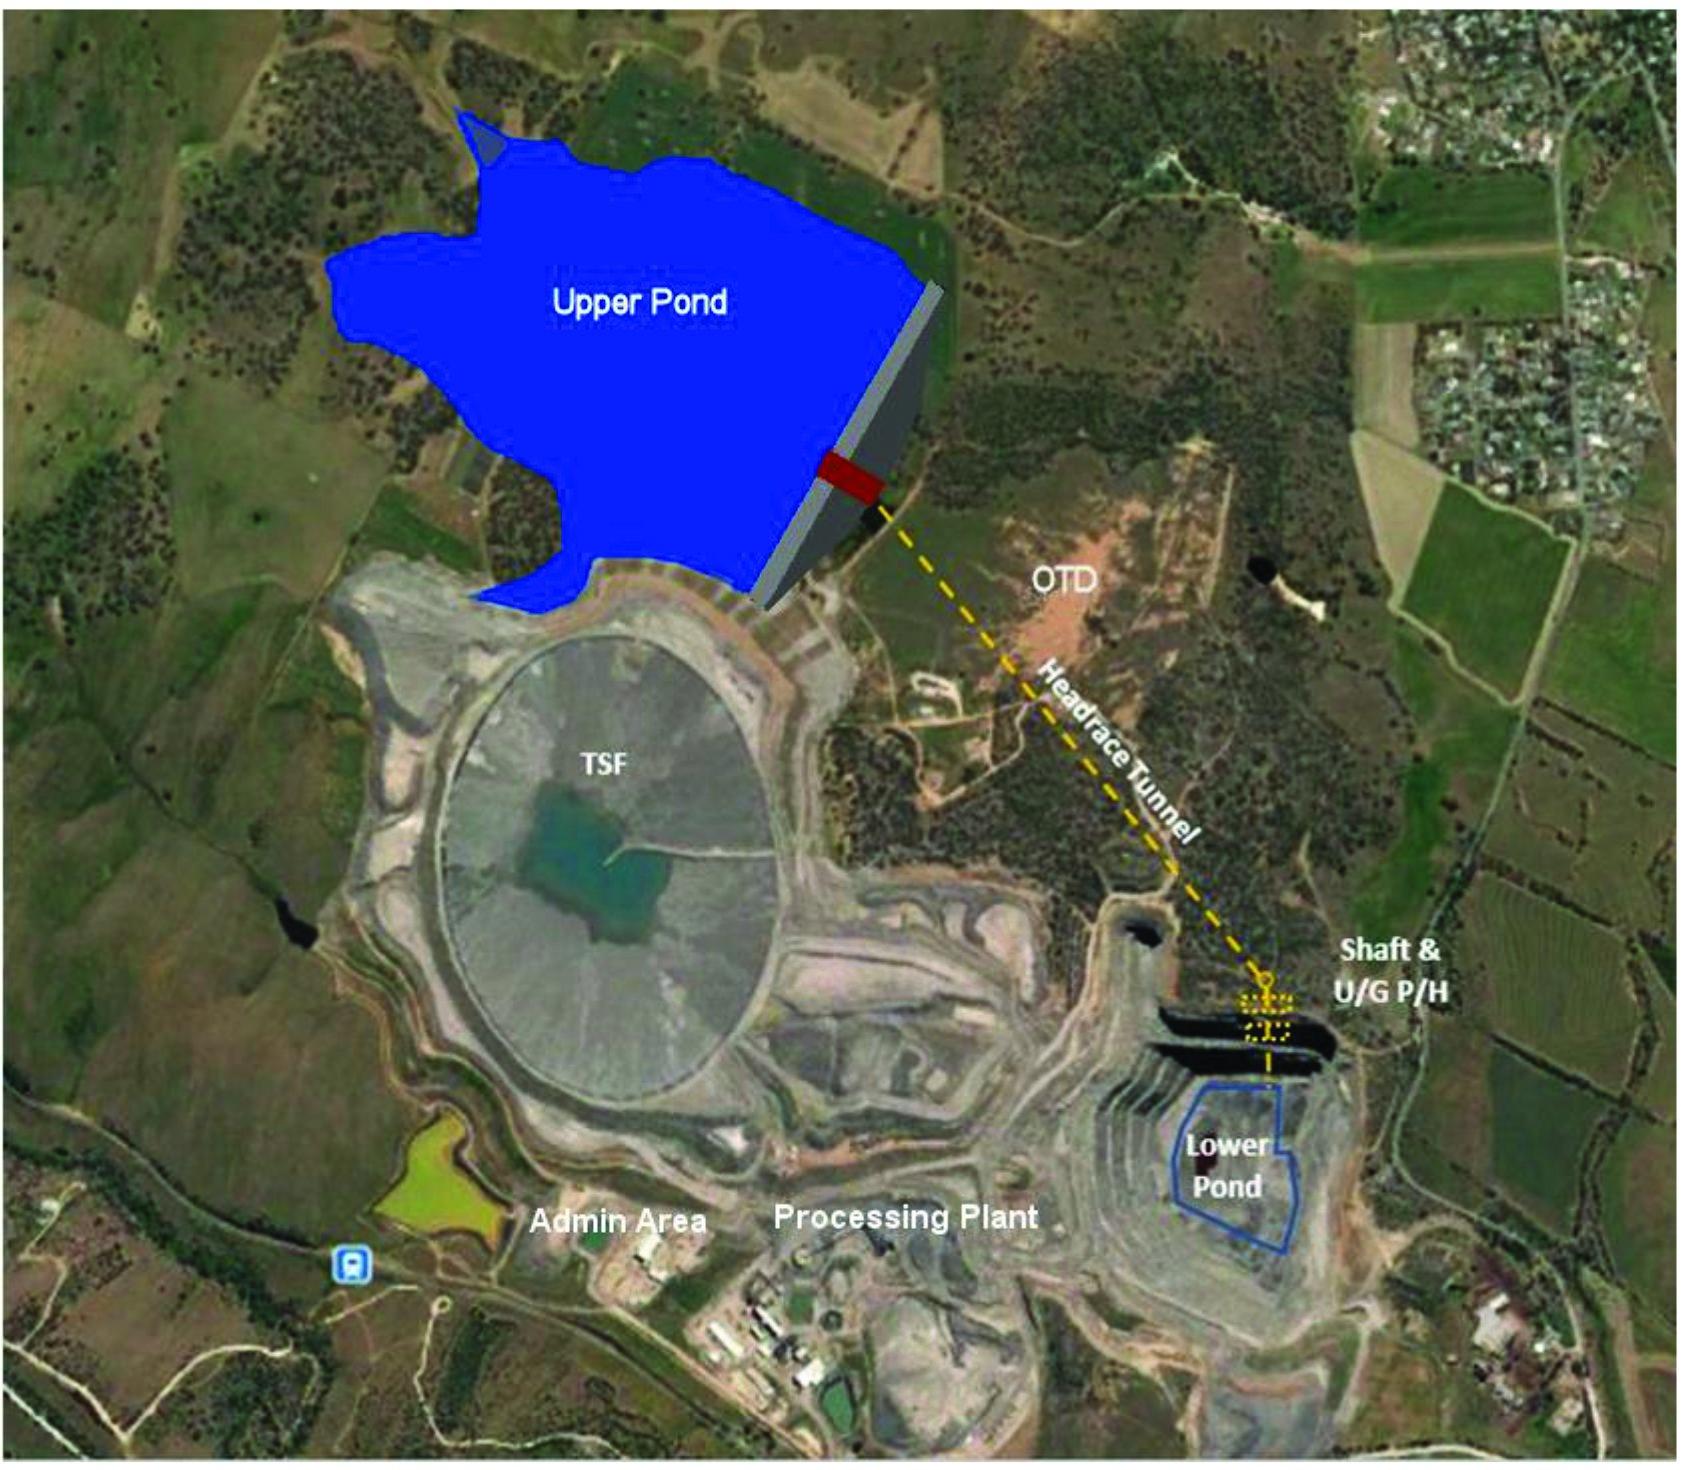 hillgrove-pumped-hydro-project-south-australia